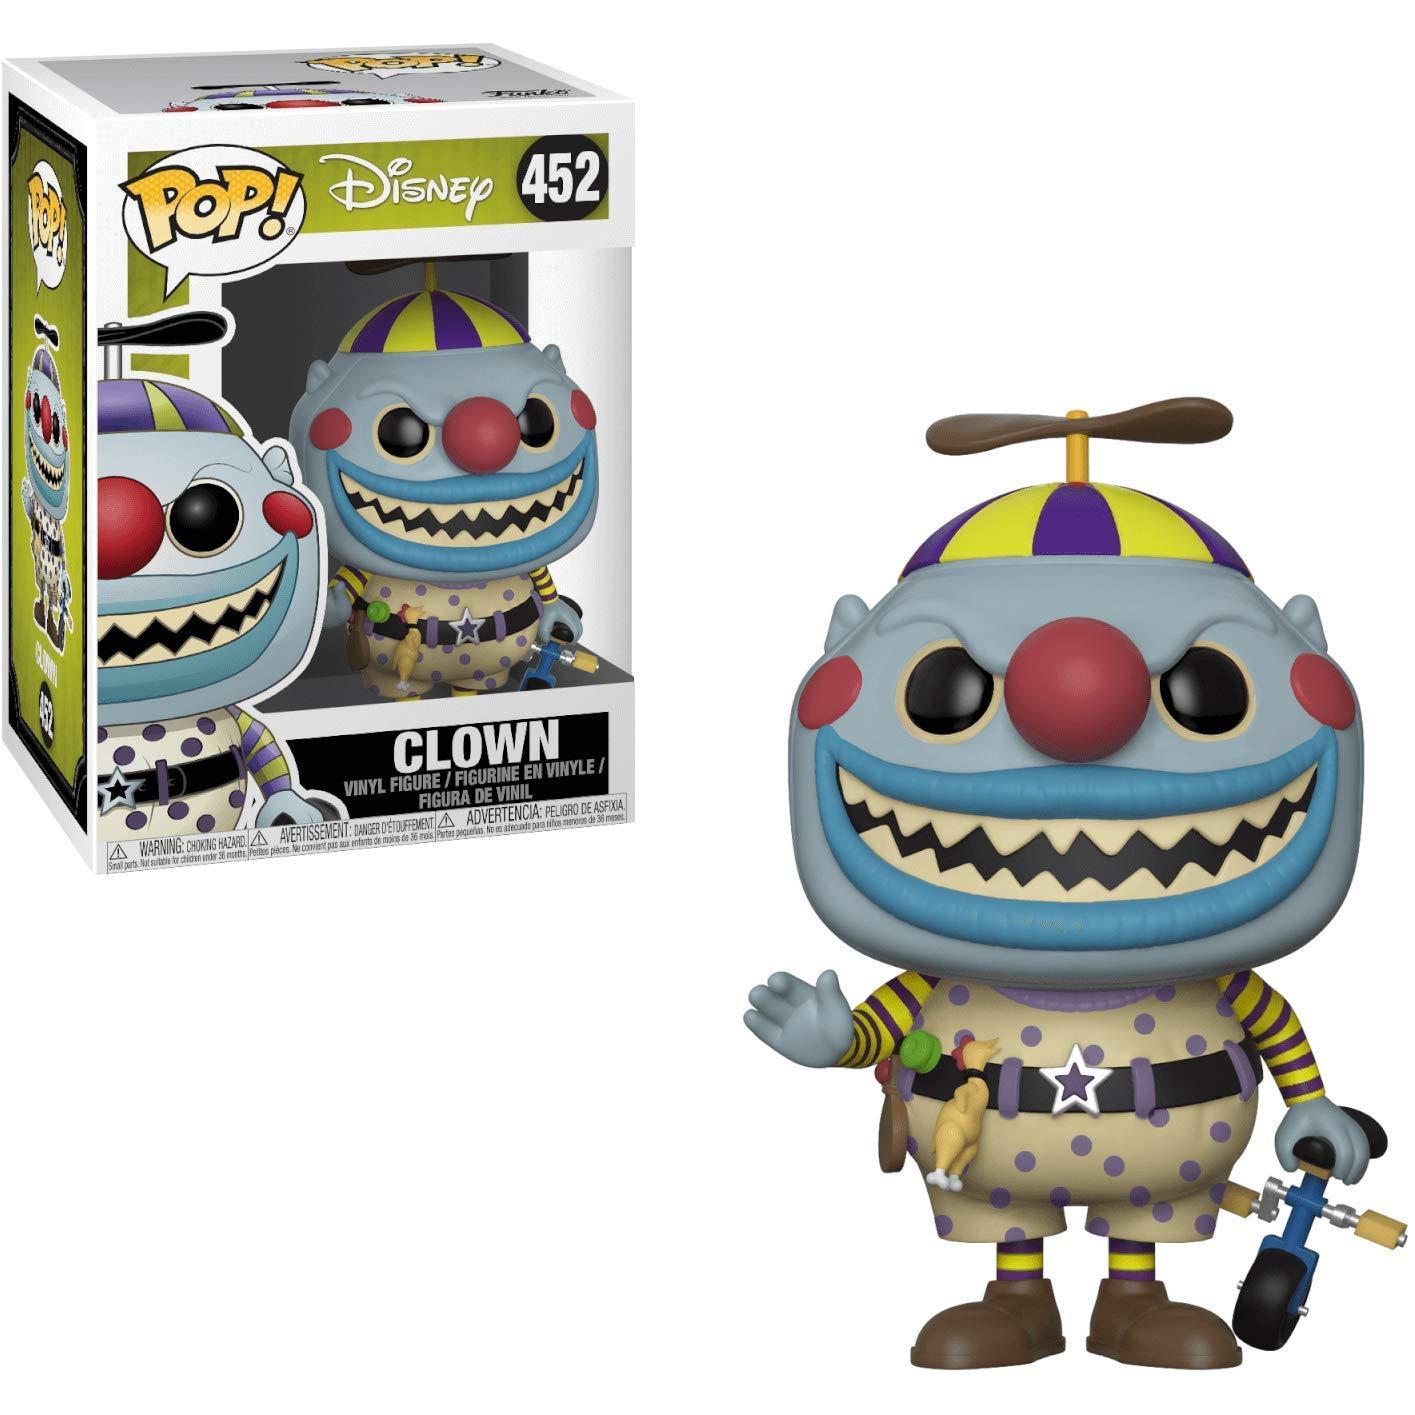 Clown Vinyl Figure Disney: The Nightmare Before Christmas Funko Pop Bundled with Pop Box Protector Case